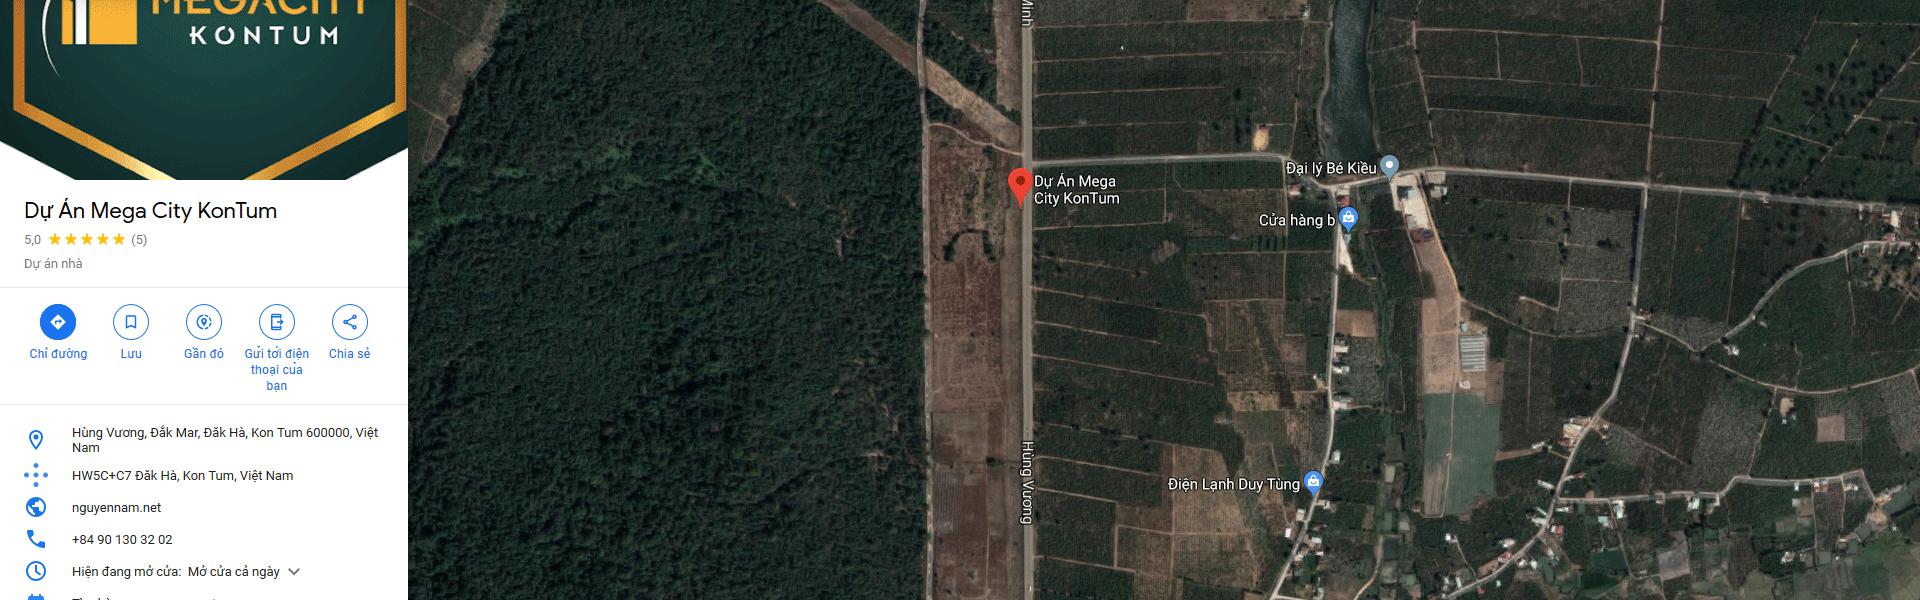 Vị trí dự án Mega City Kon Tum